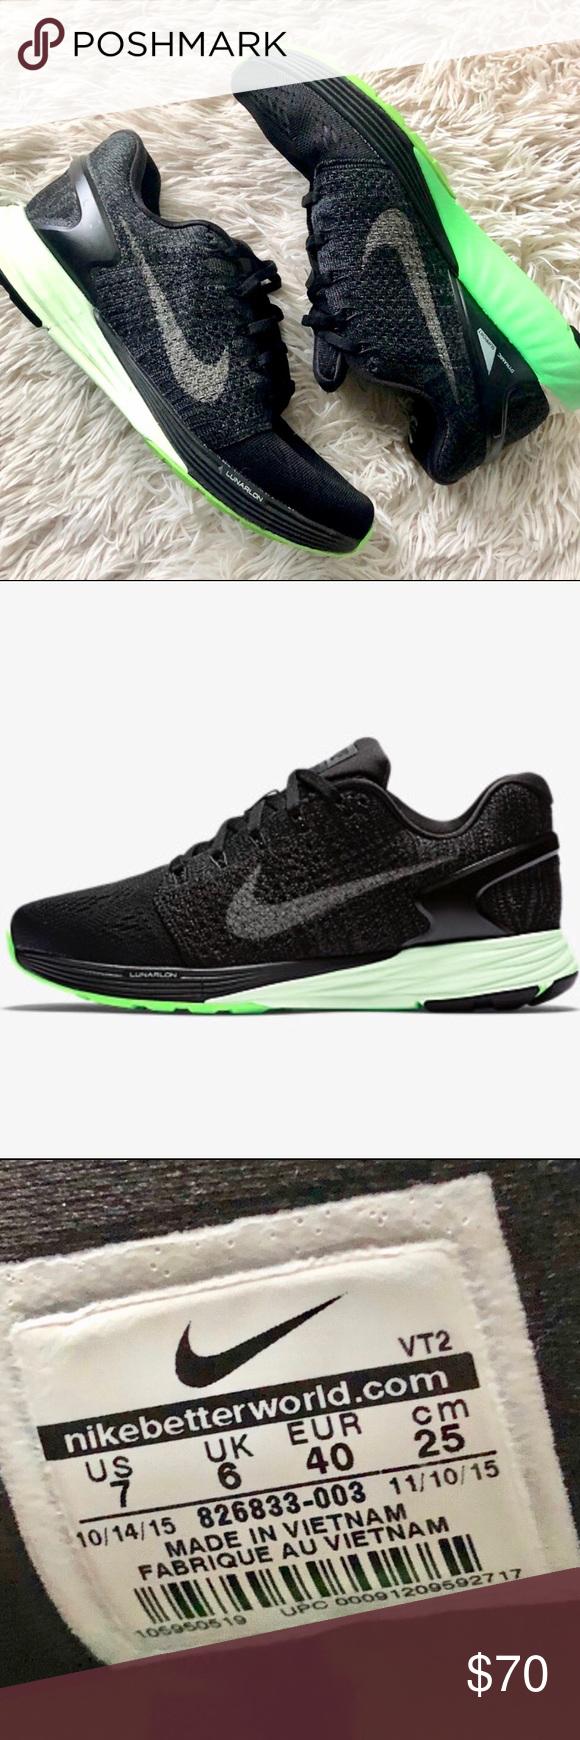 buy popular b22b2 190de Men s Nike Black   Green Lunarglide 7 Shoe, sz 7 Stylish   Sporty Mens Nike  Black Lunarglide 7 Running Shoe. Men s size 7 (fits women s size 9).